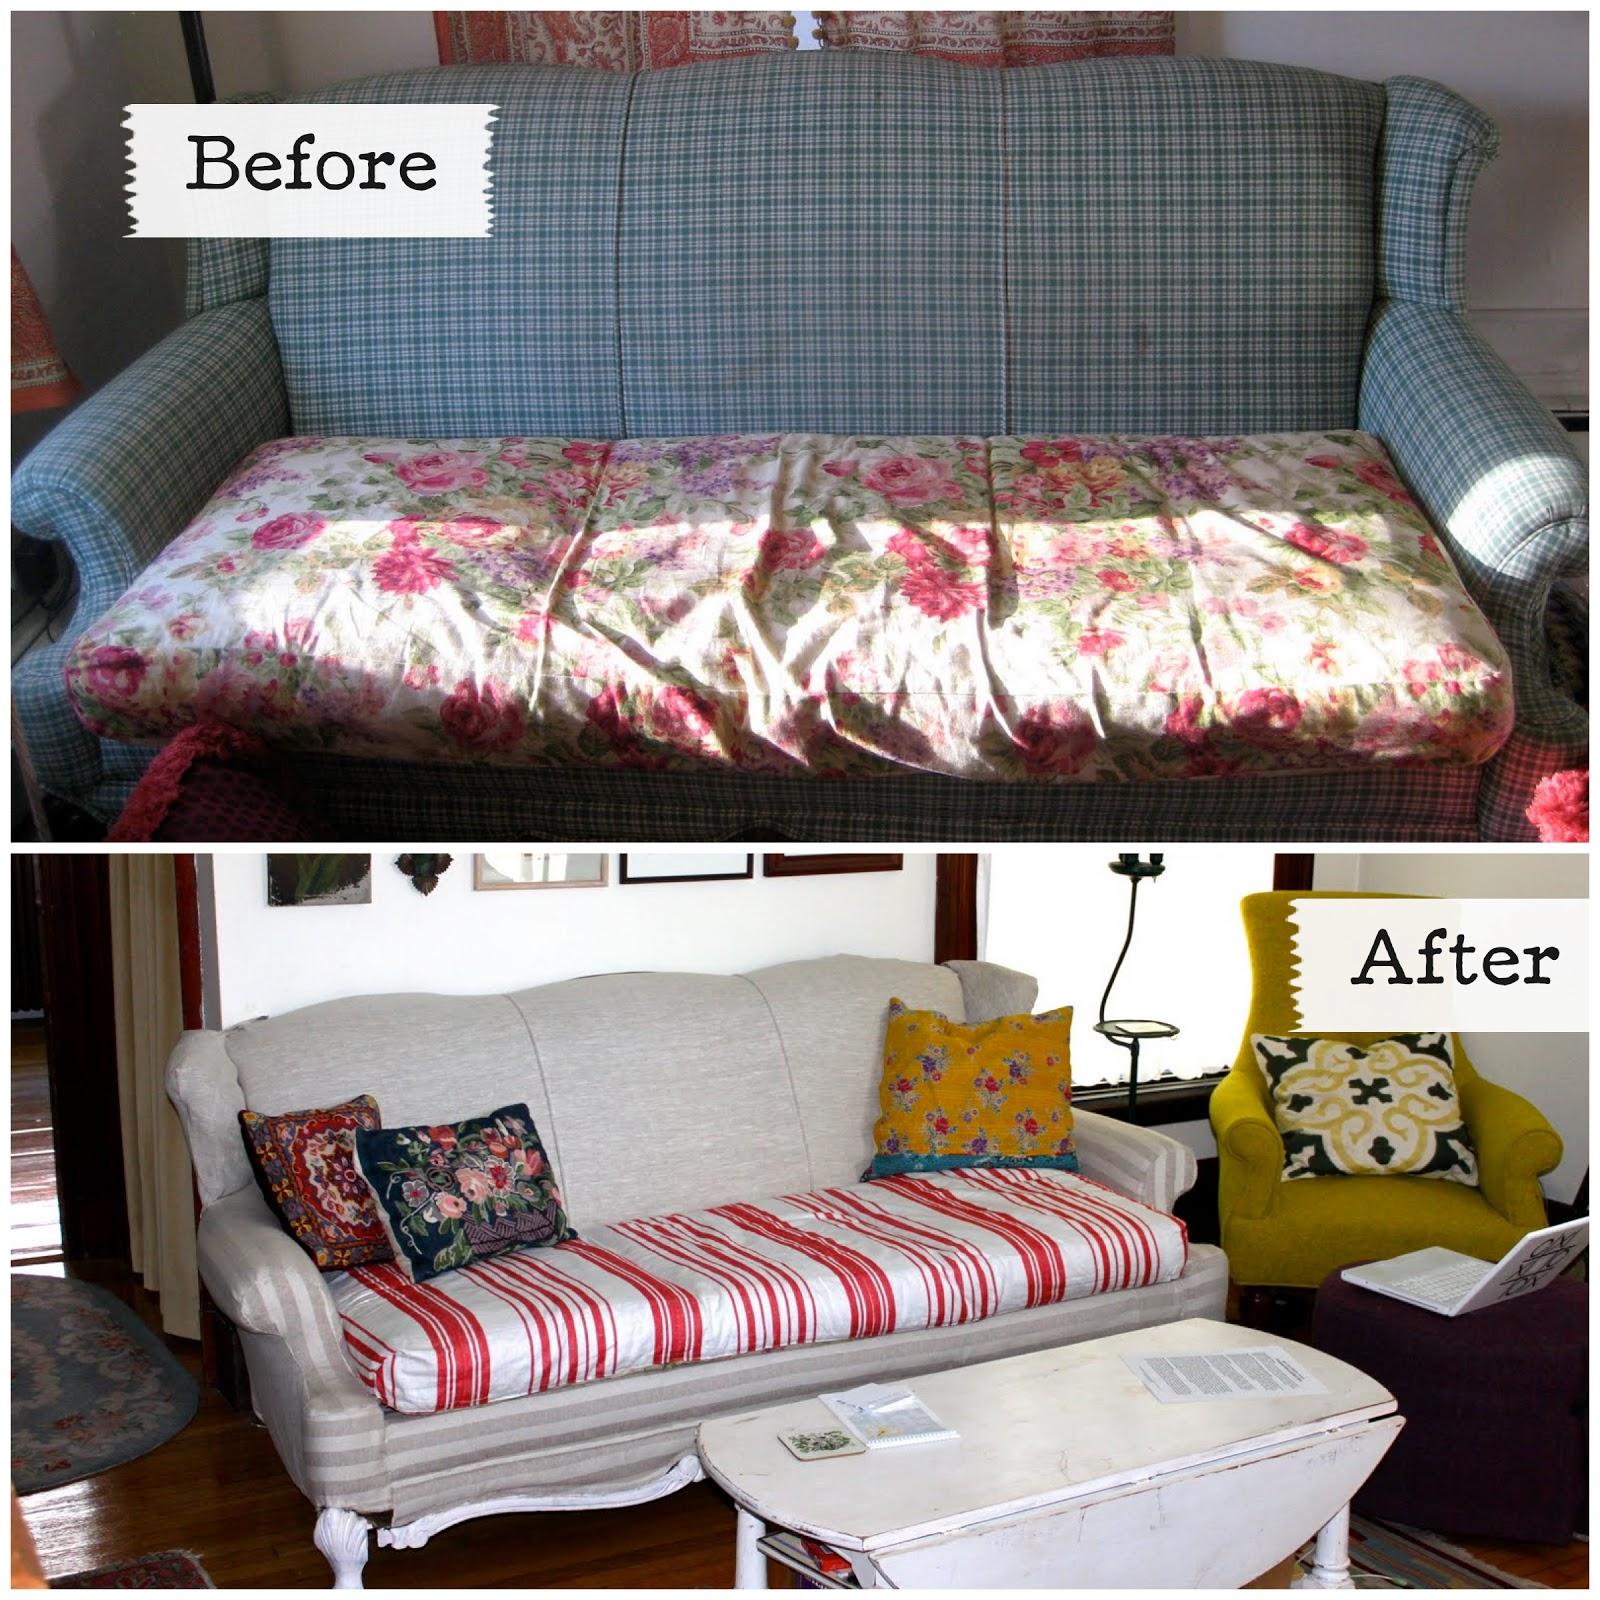 How Much Fabric To Make A Sofa Cover Blue Denim Sleeper Tiptoethrough Diy Upgrade On The Cheap